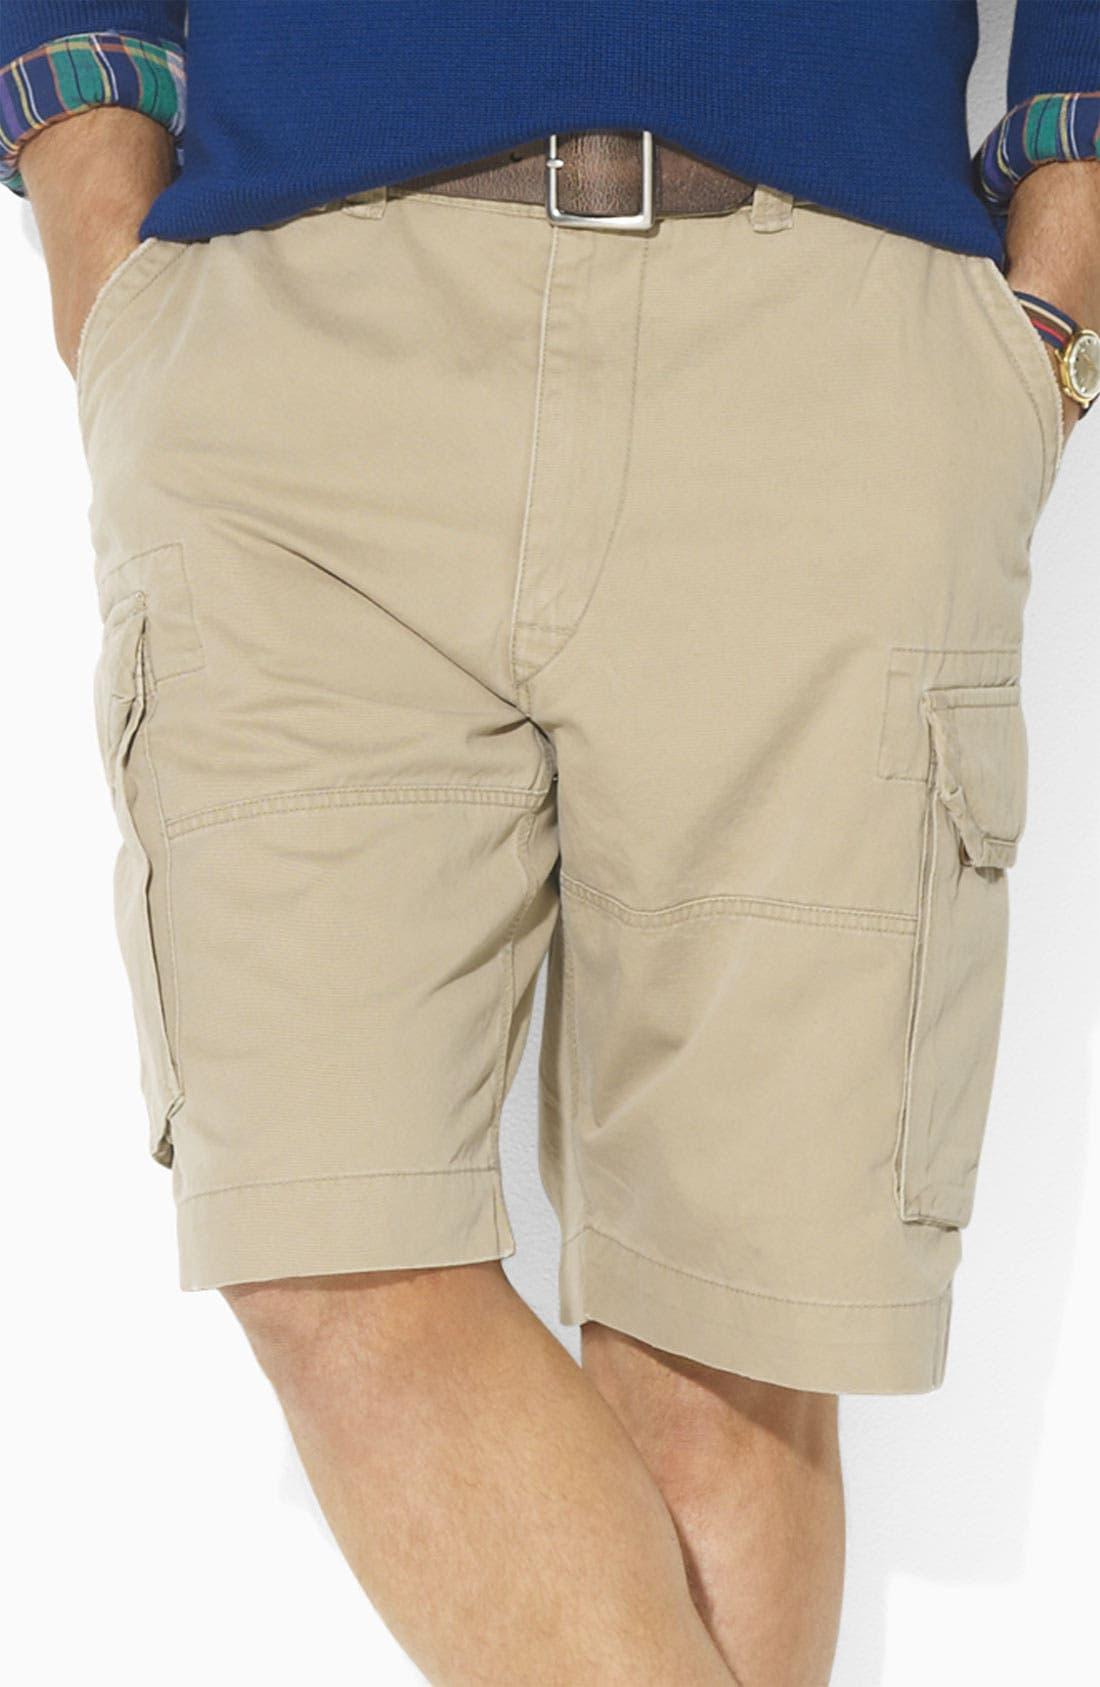 Main Image - Polo Ralph Lauren 'Gellar' Fatigue Cargo Shorts (Big & Tall)